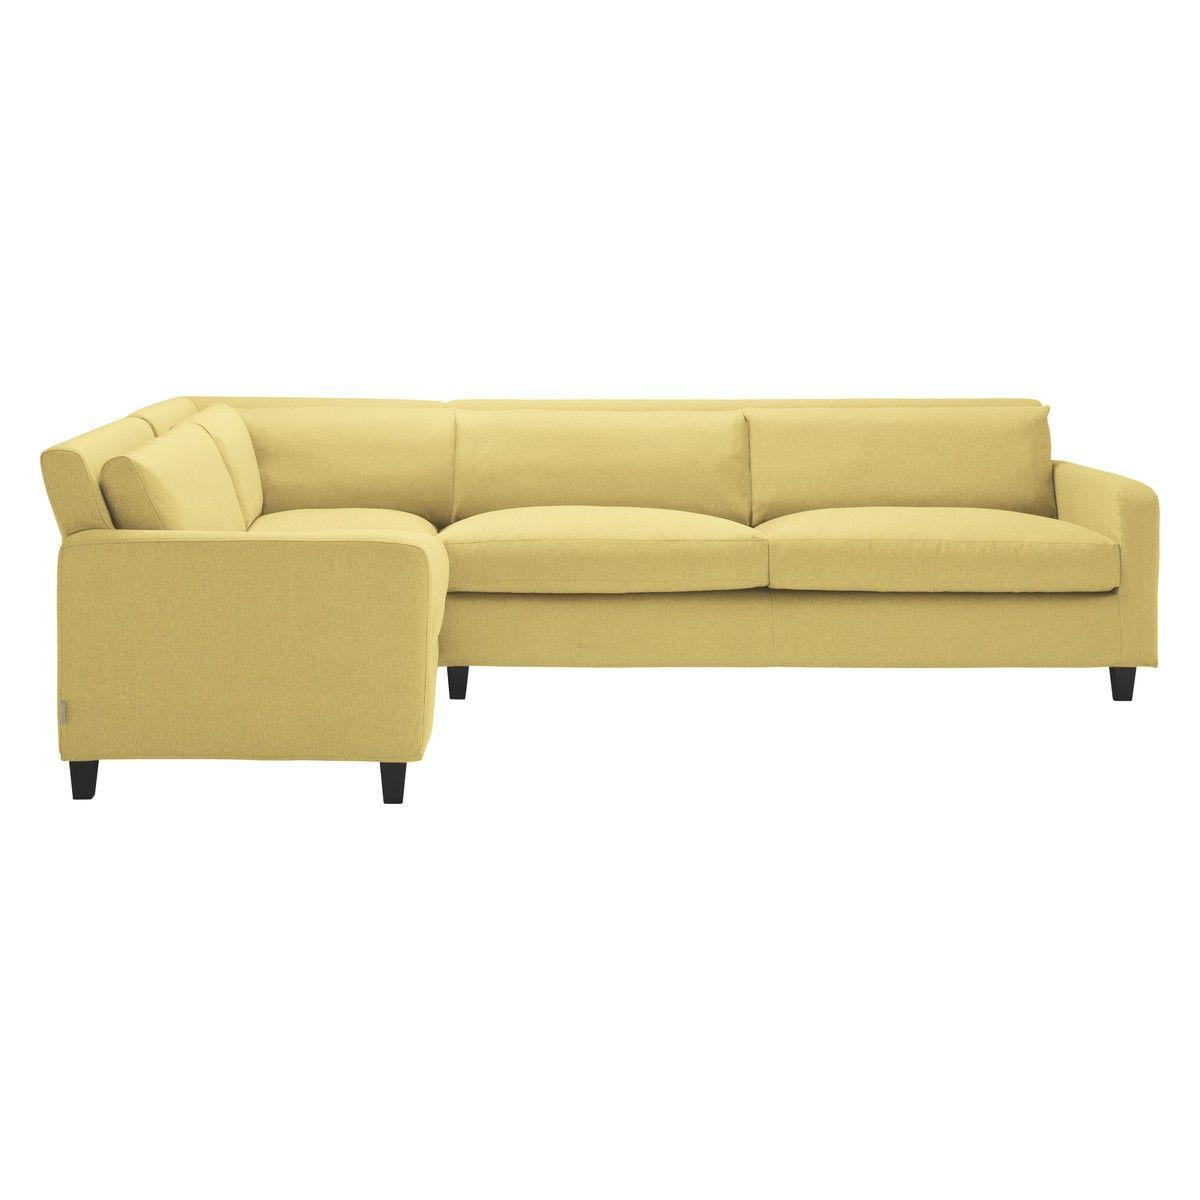 Chester Yellow Fabric Right Arm Corner Sofa Dark Stained Feet Corner Sofa Sofa Yellow Fabric